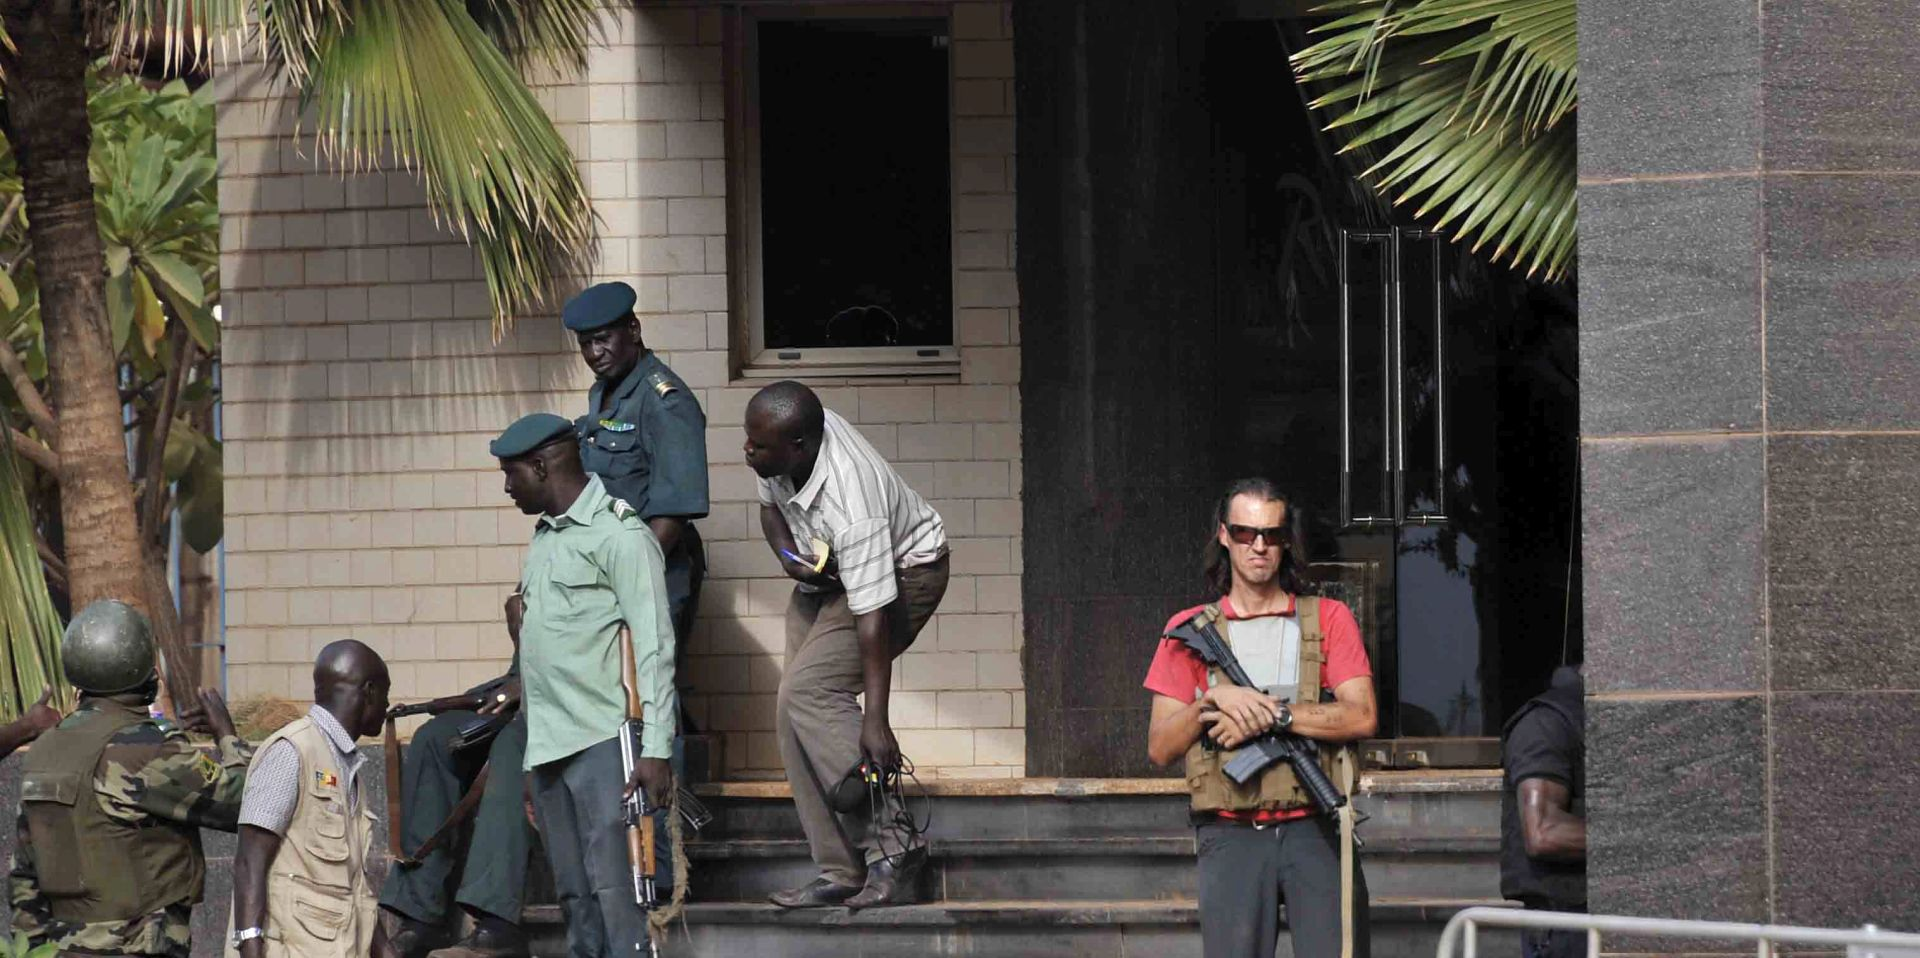 Mali: Državna TV prikazala snimke počinitelja napada na hotel